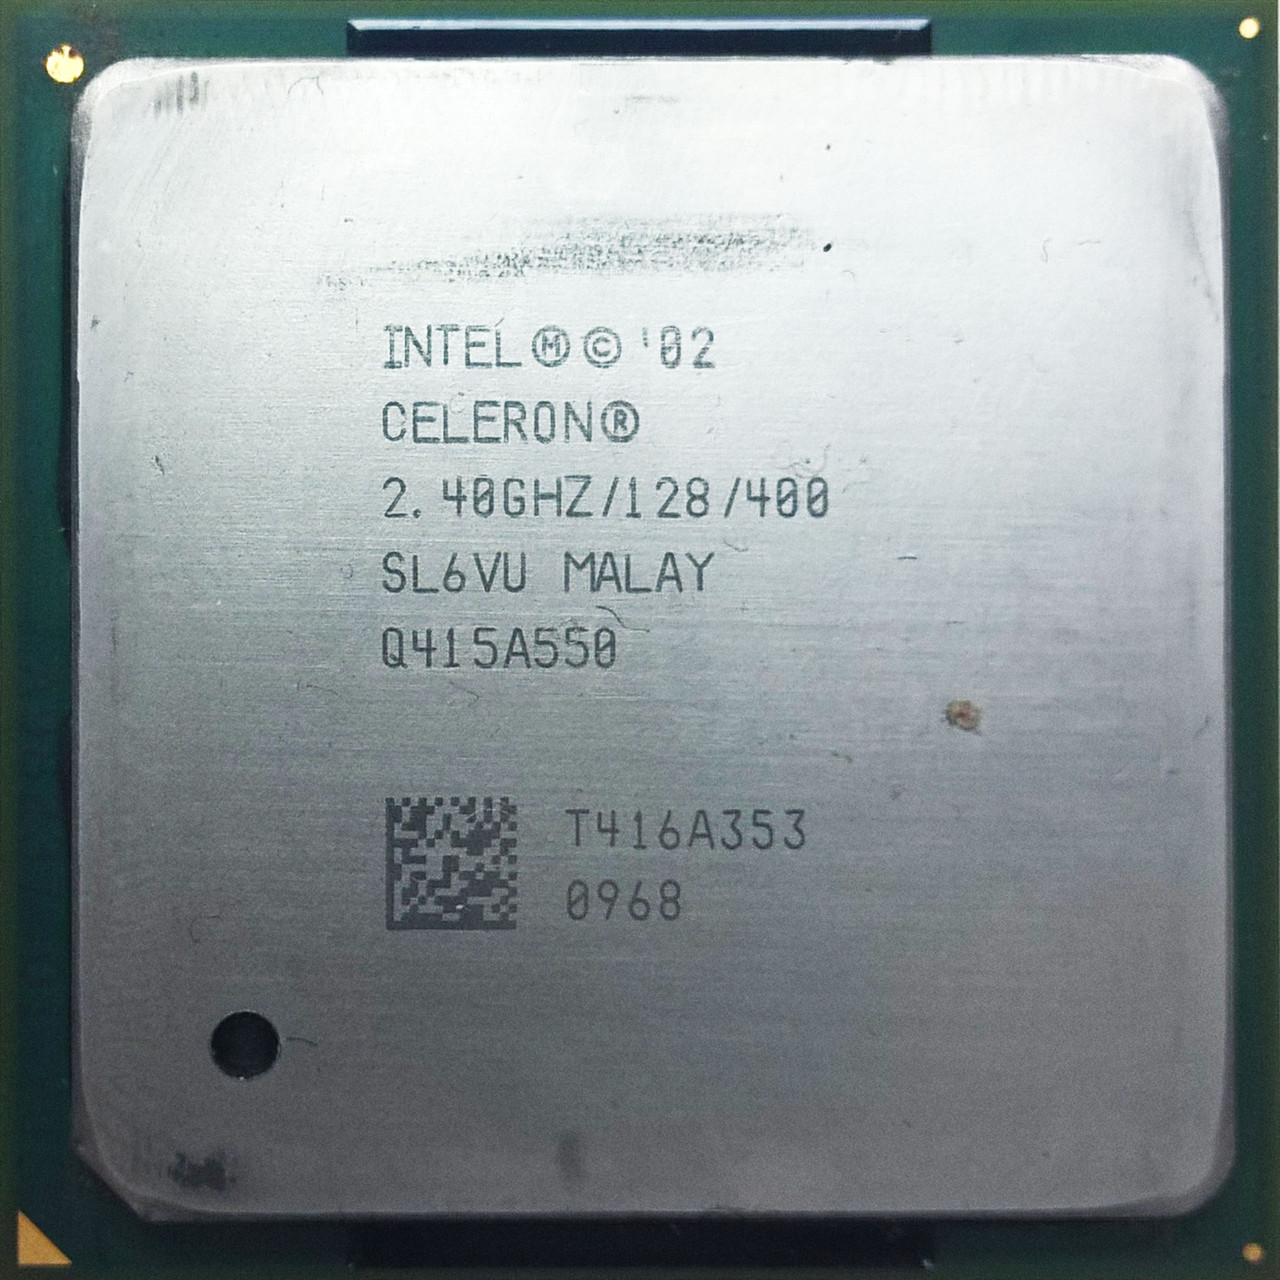 Процессор Intel Celeron 2.40Ghz/128/400 (SL6VU) s478, tray